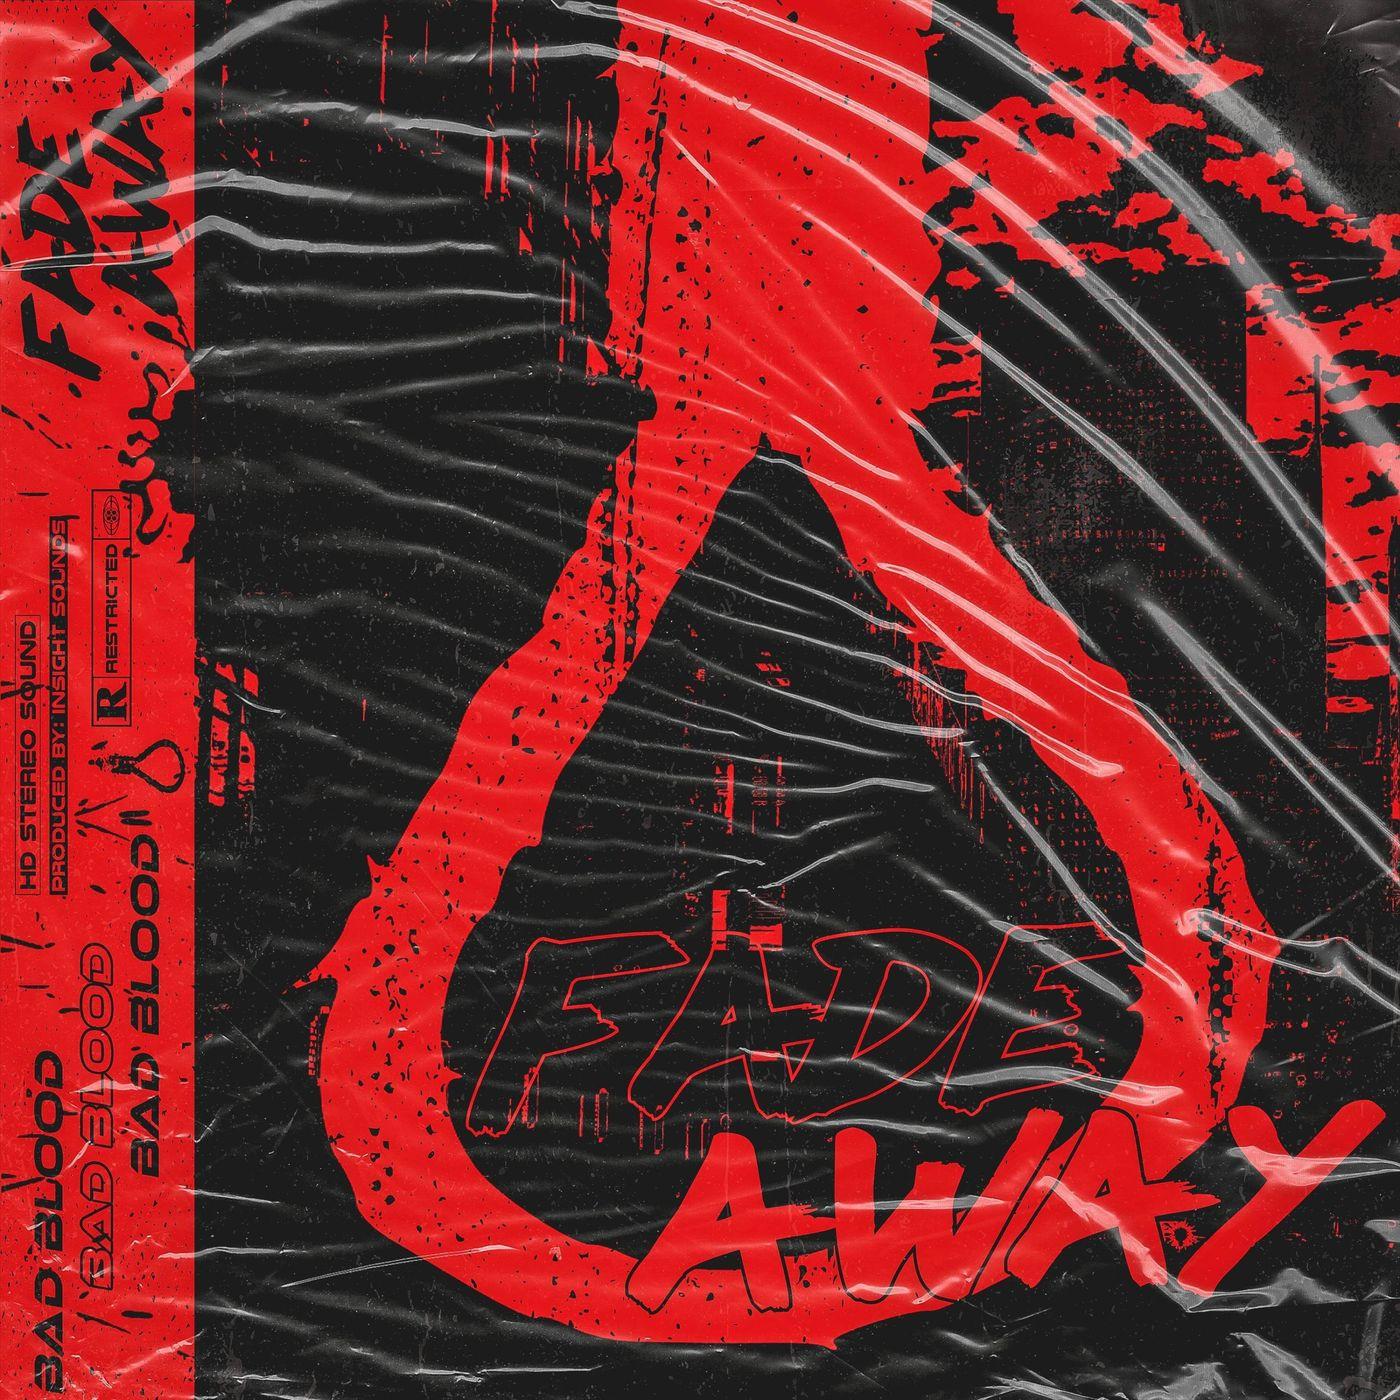 Bad Blood - Fade Away [single] (2021)